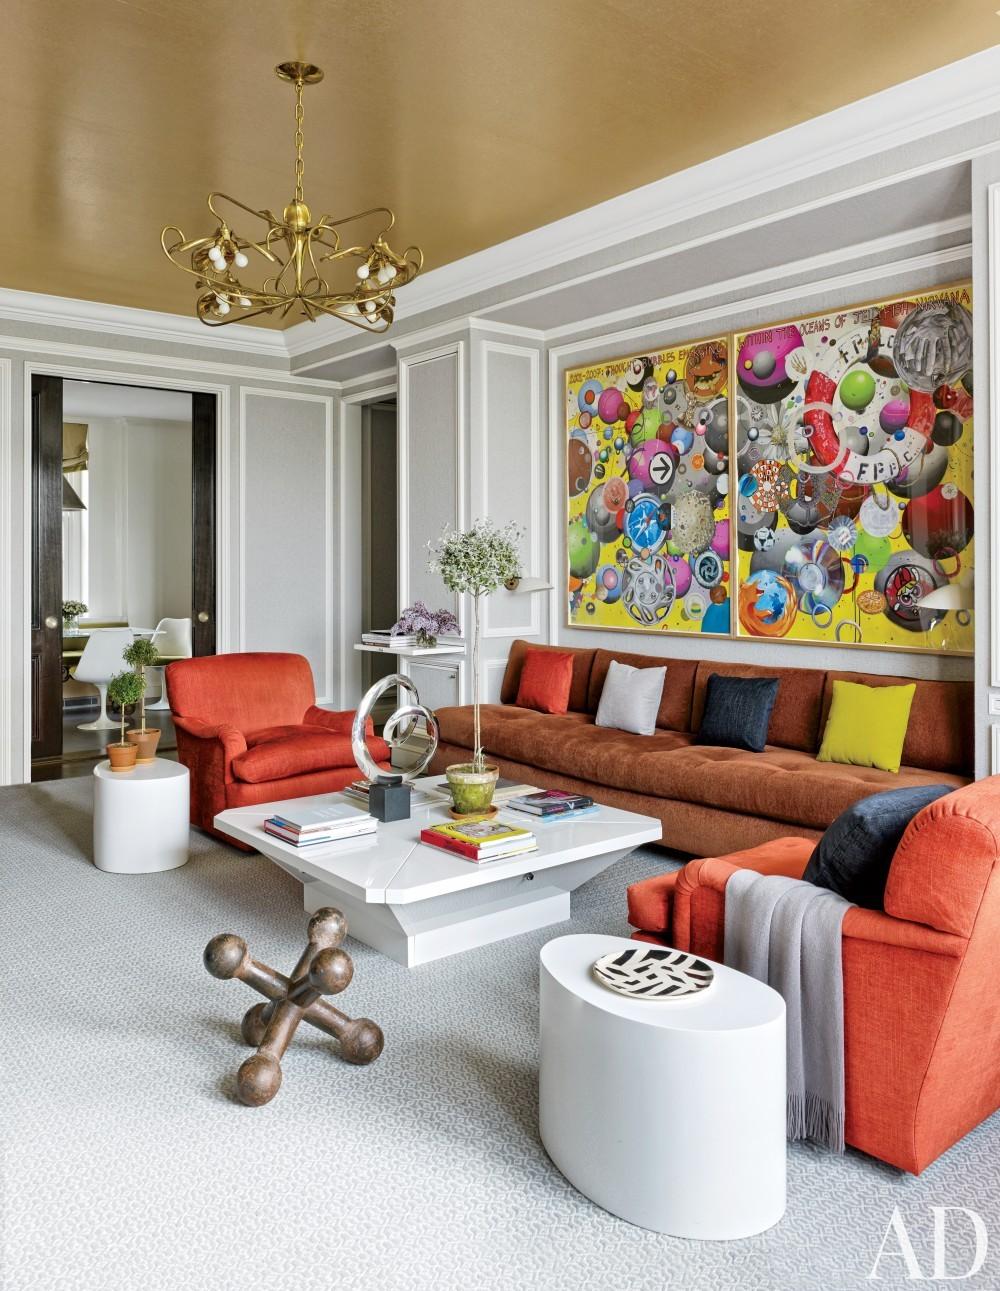 Modern Living Room by Stephen Sills Associates and John B. Murray Architect in New York, New York